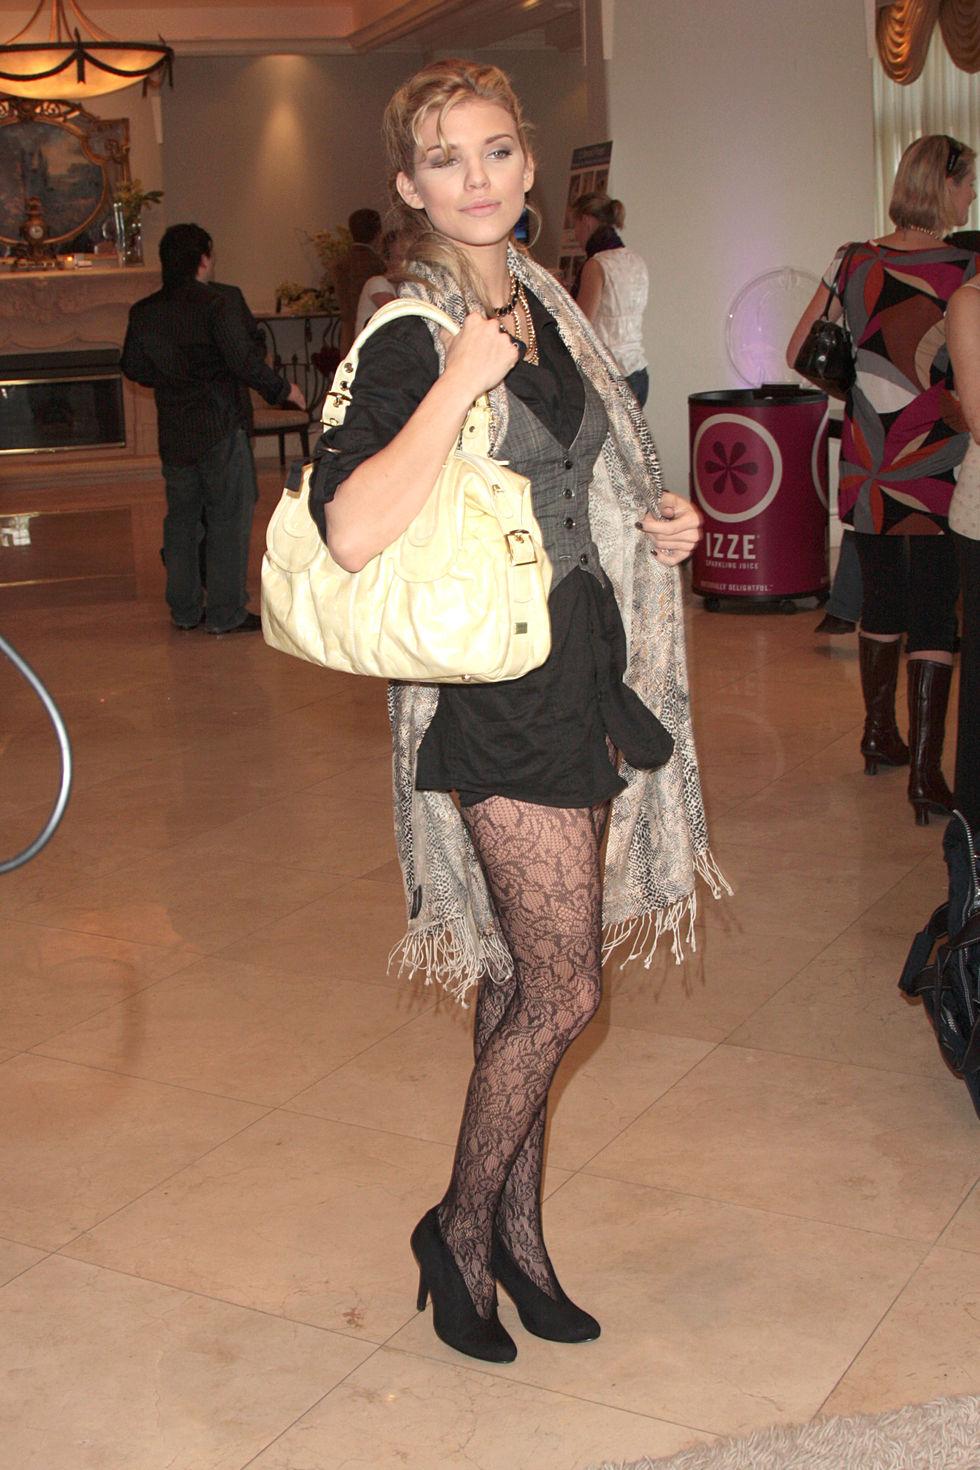 annalynne-mccord-haven-2009-oscar-suite-in-los-angeles-01